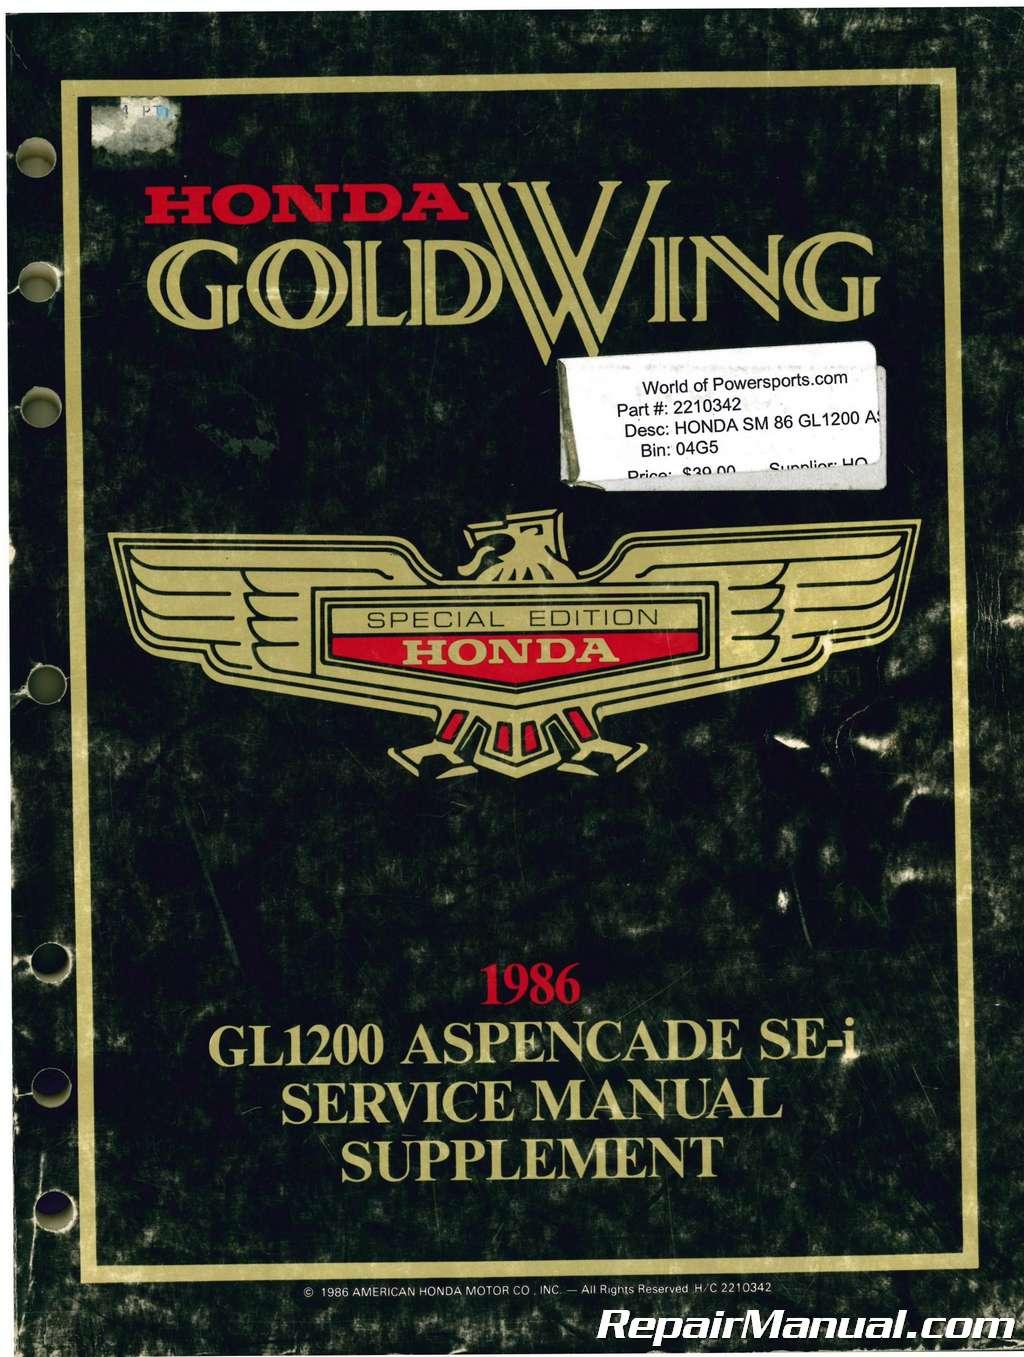 Used 1986 Honda GL1200 Aspencade SE-i Service Manual Supplement